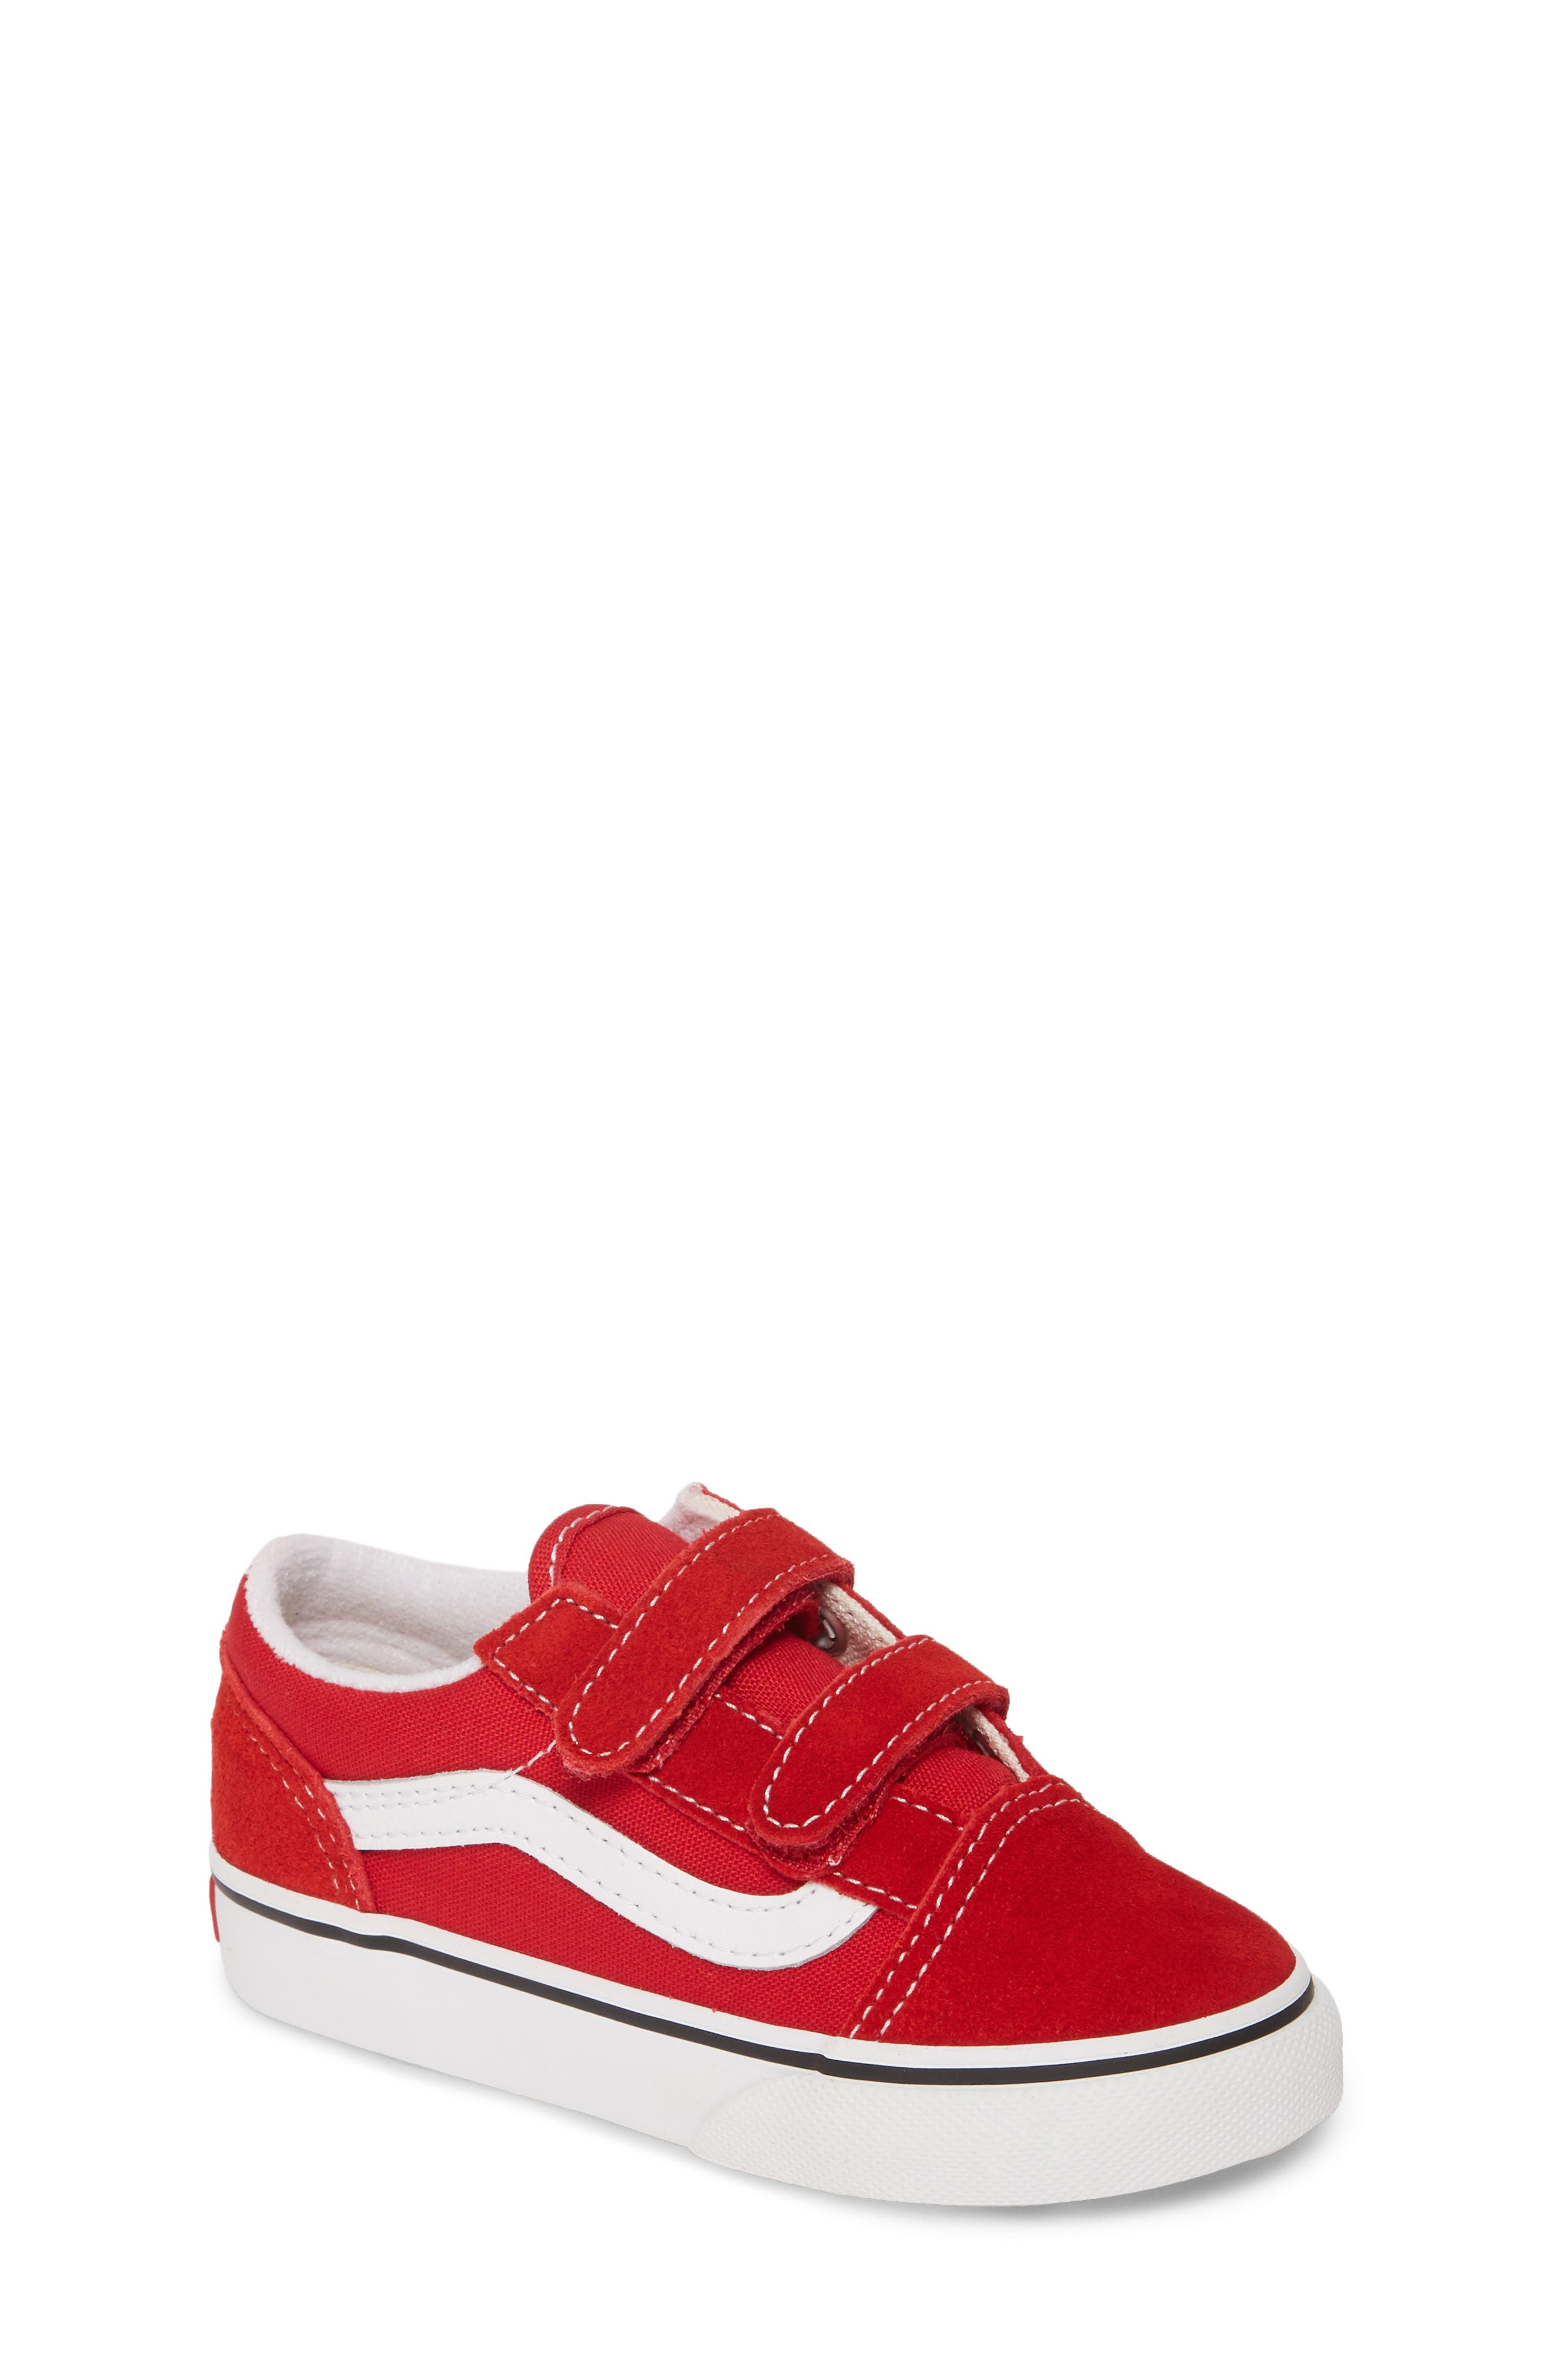 Vans Sk8 Hi MTE Color Block Skate Shoe Little Kid Big Kid Black Multi